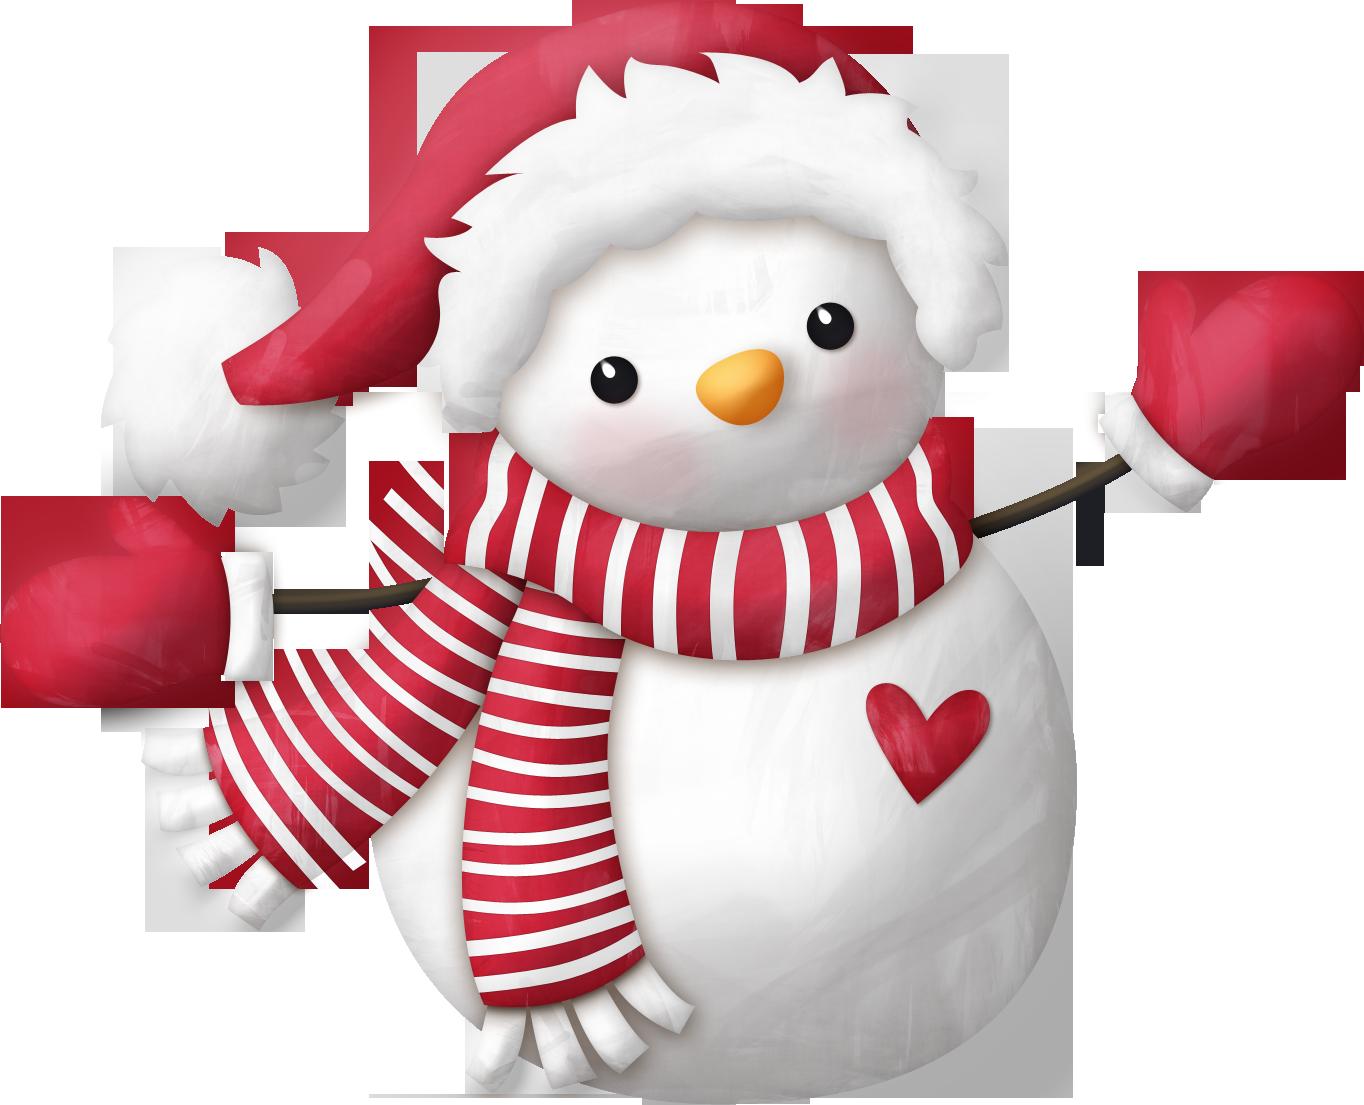 0 C45ef 2c46fd97 Orig Png 1364 1105 Cute Snowman Snowman Christmas Art